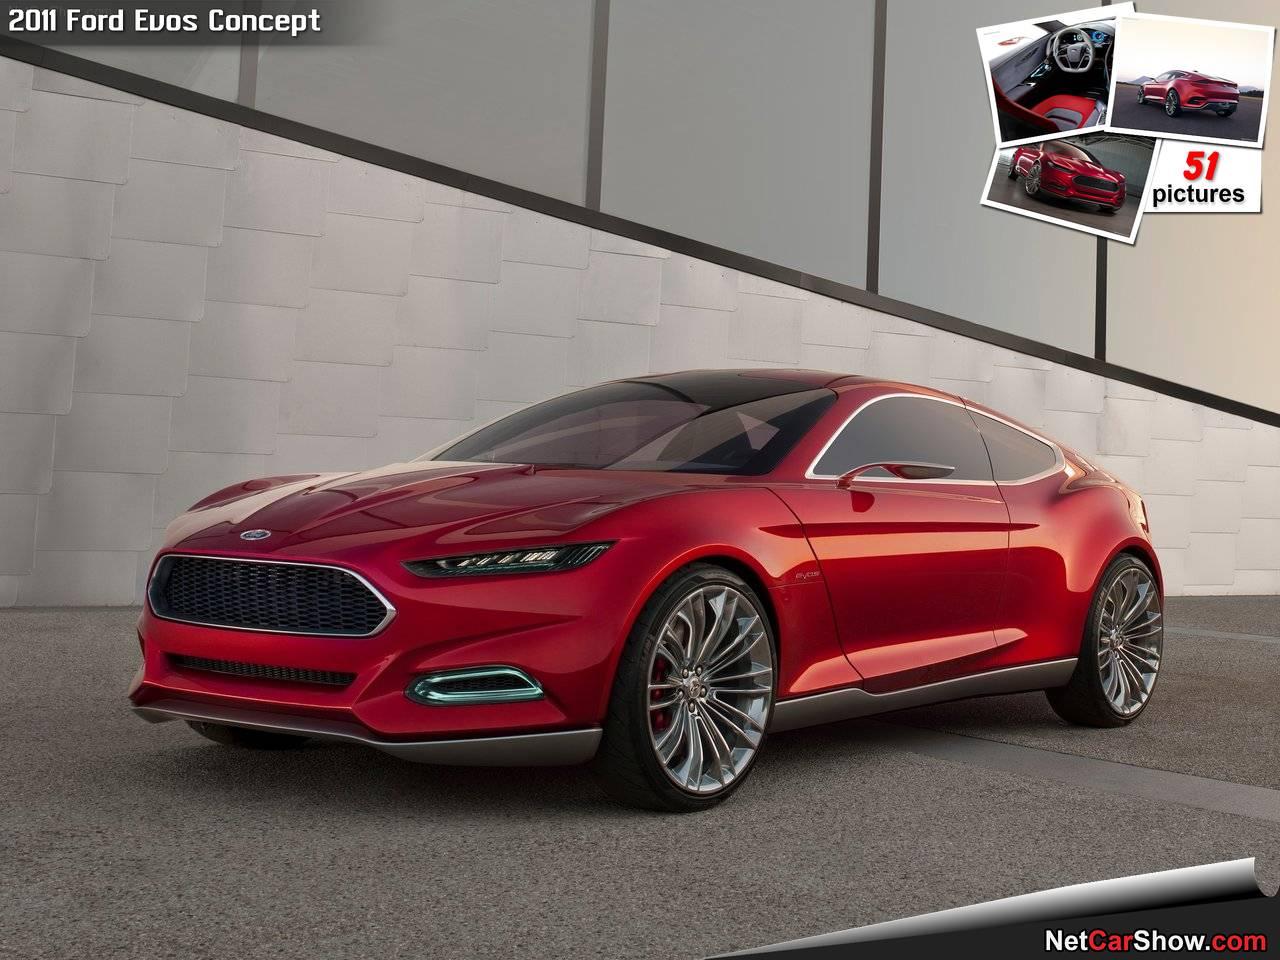 Ford-Evos_Concept-2011-1280-03.jpg